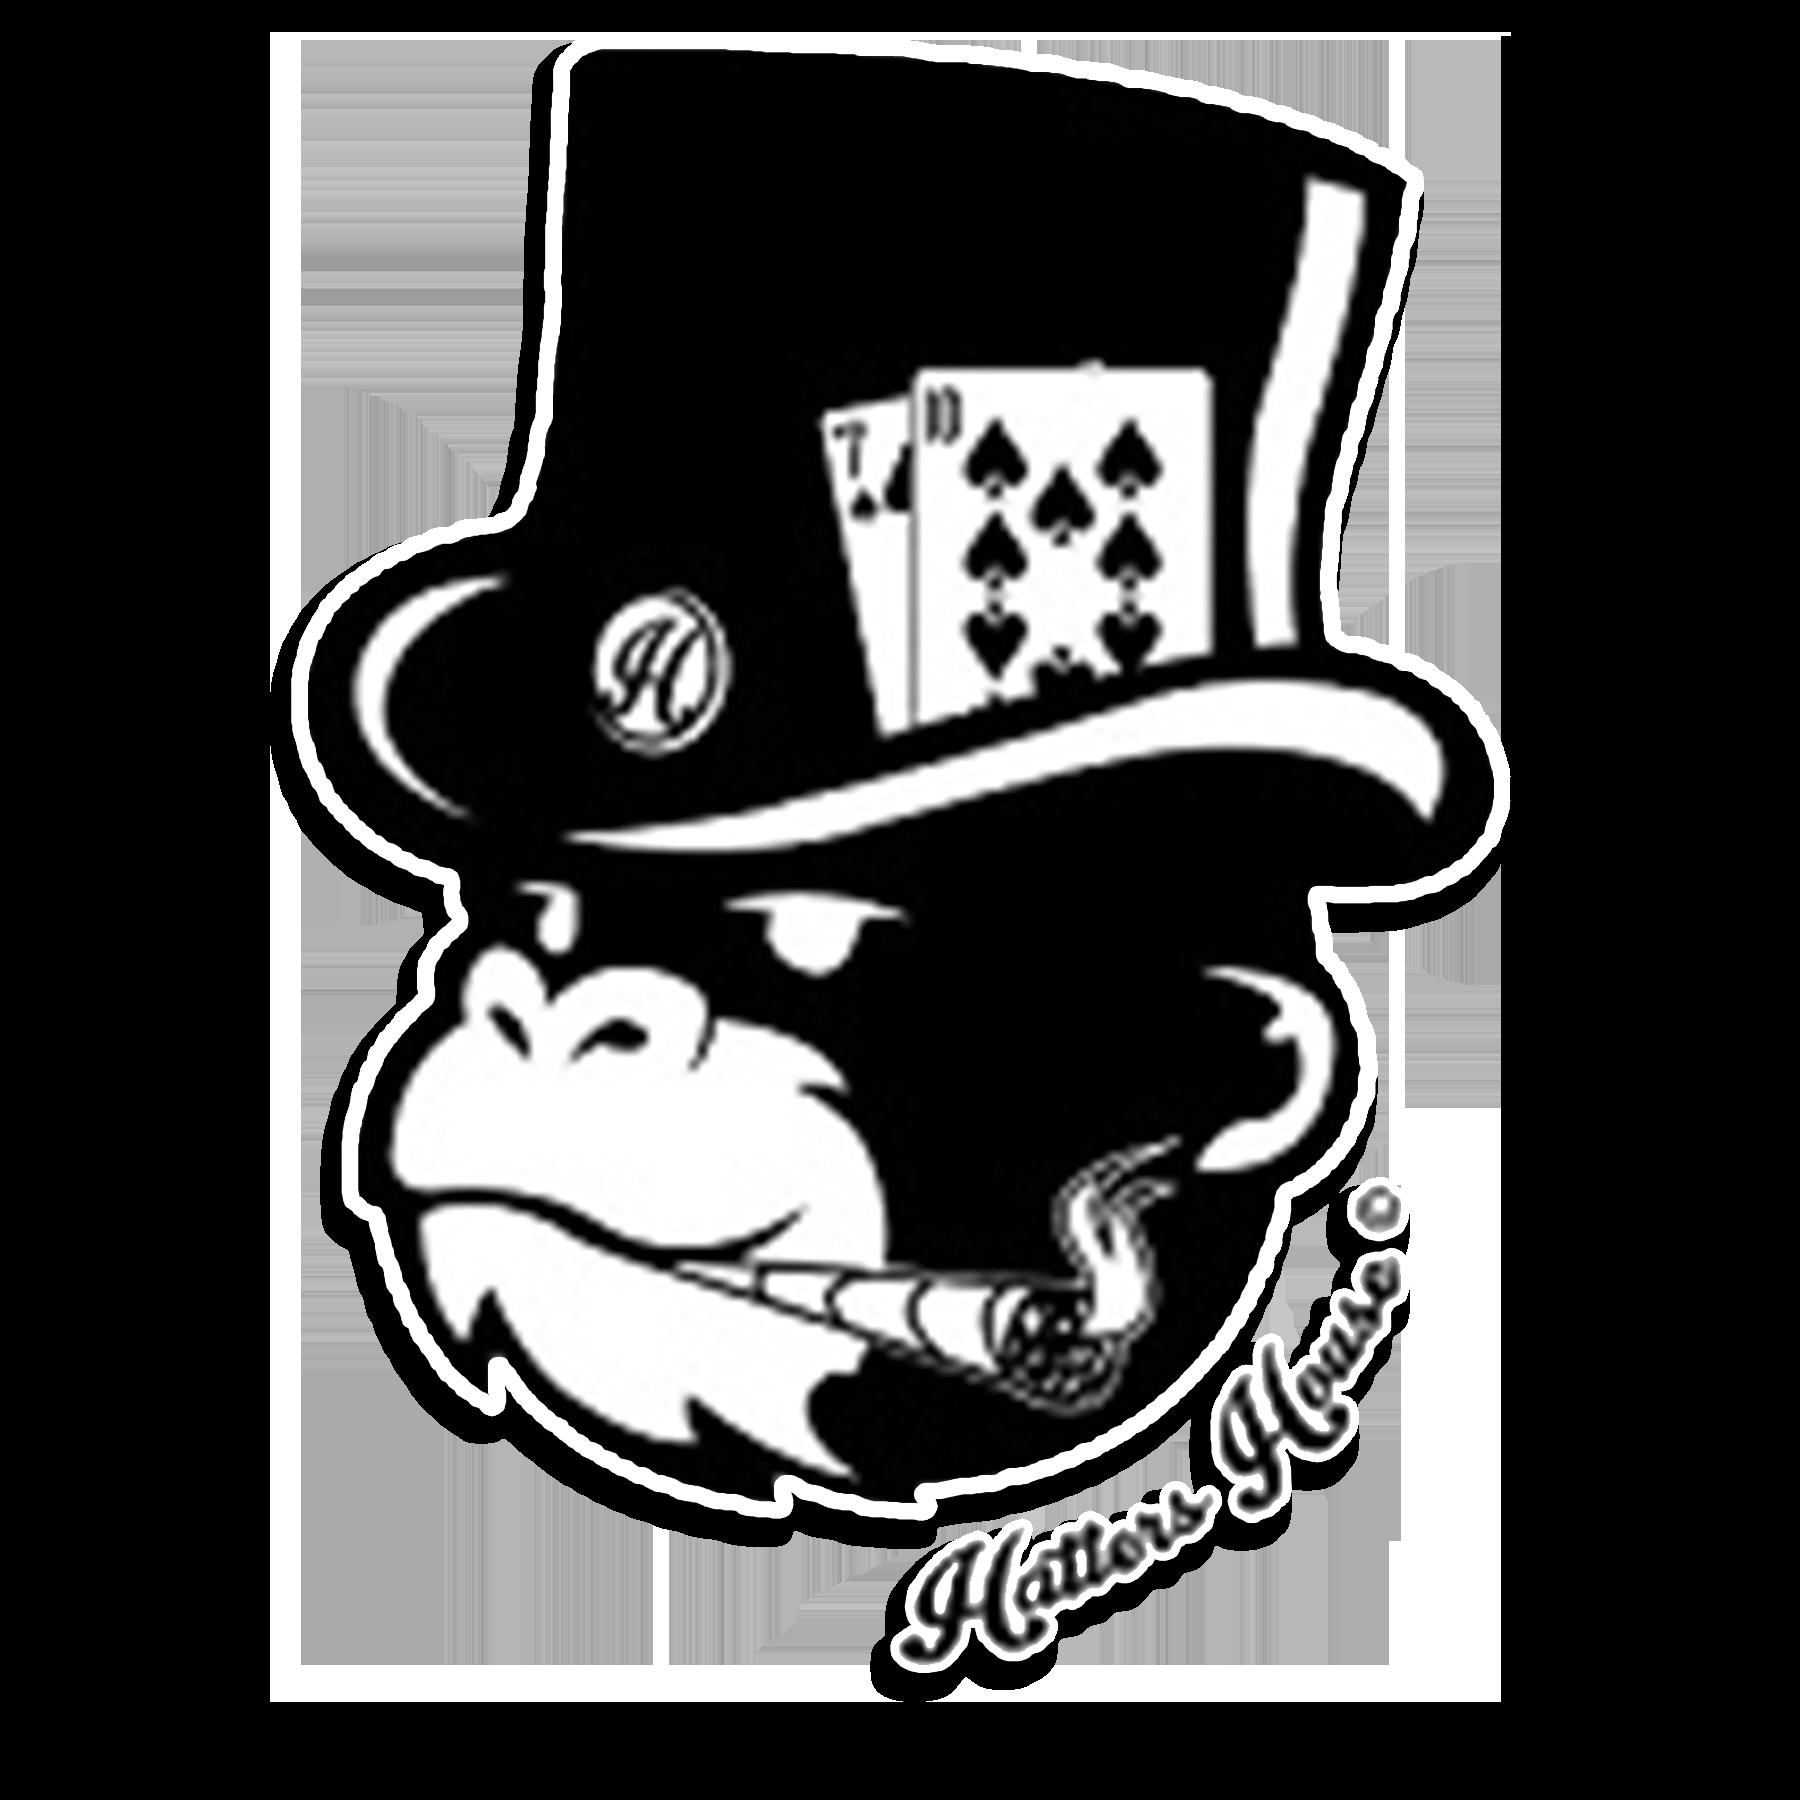 Hatters House of Holistics logo